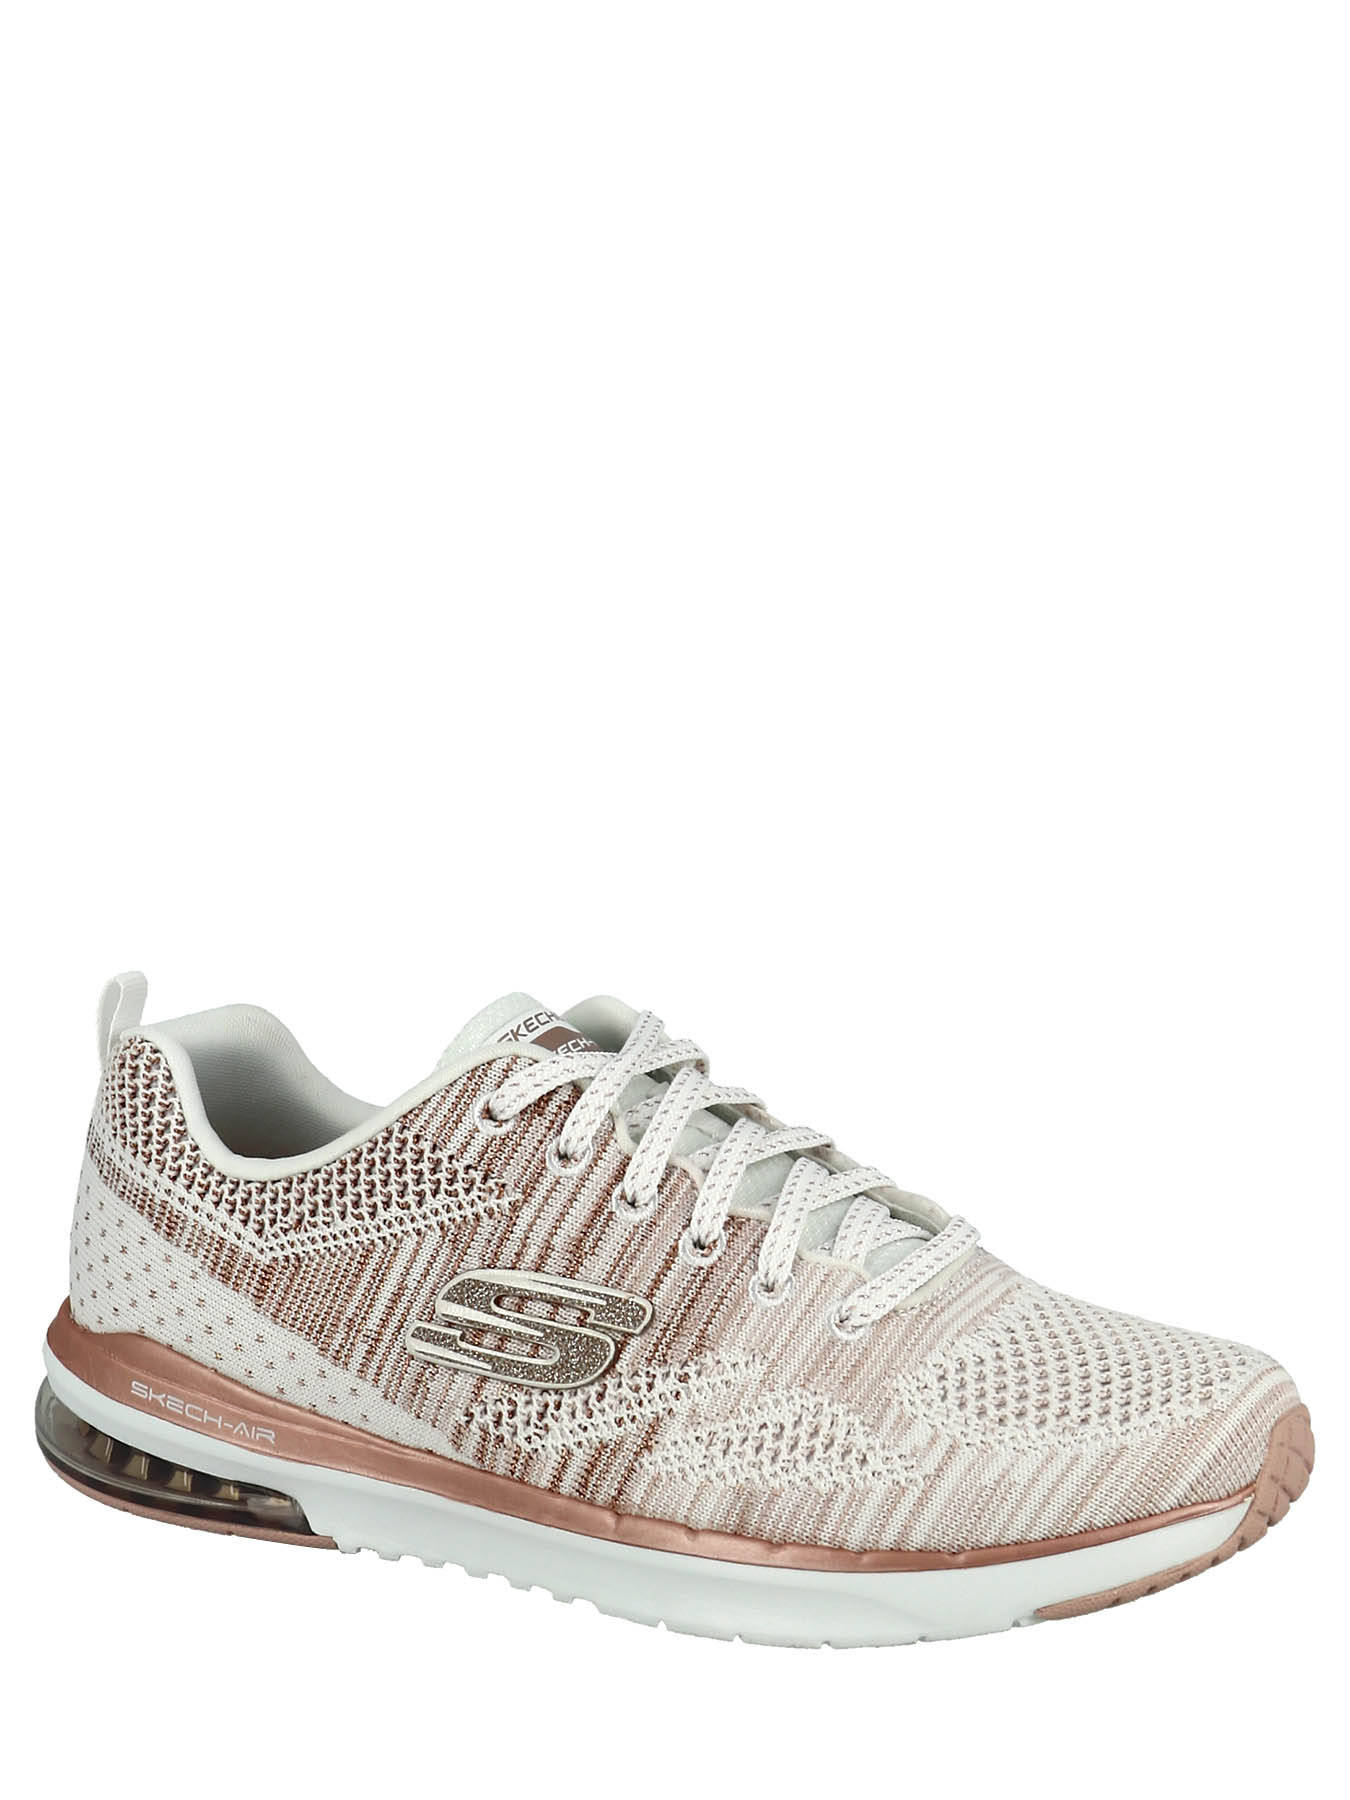 Skechers Sneakers 12114 - best prices